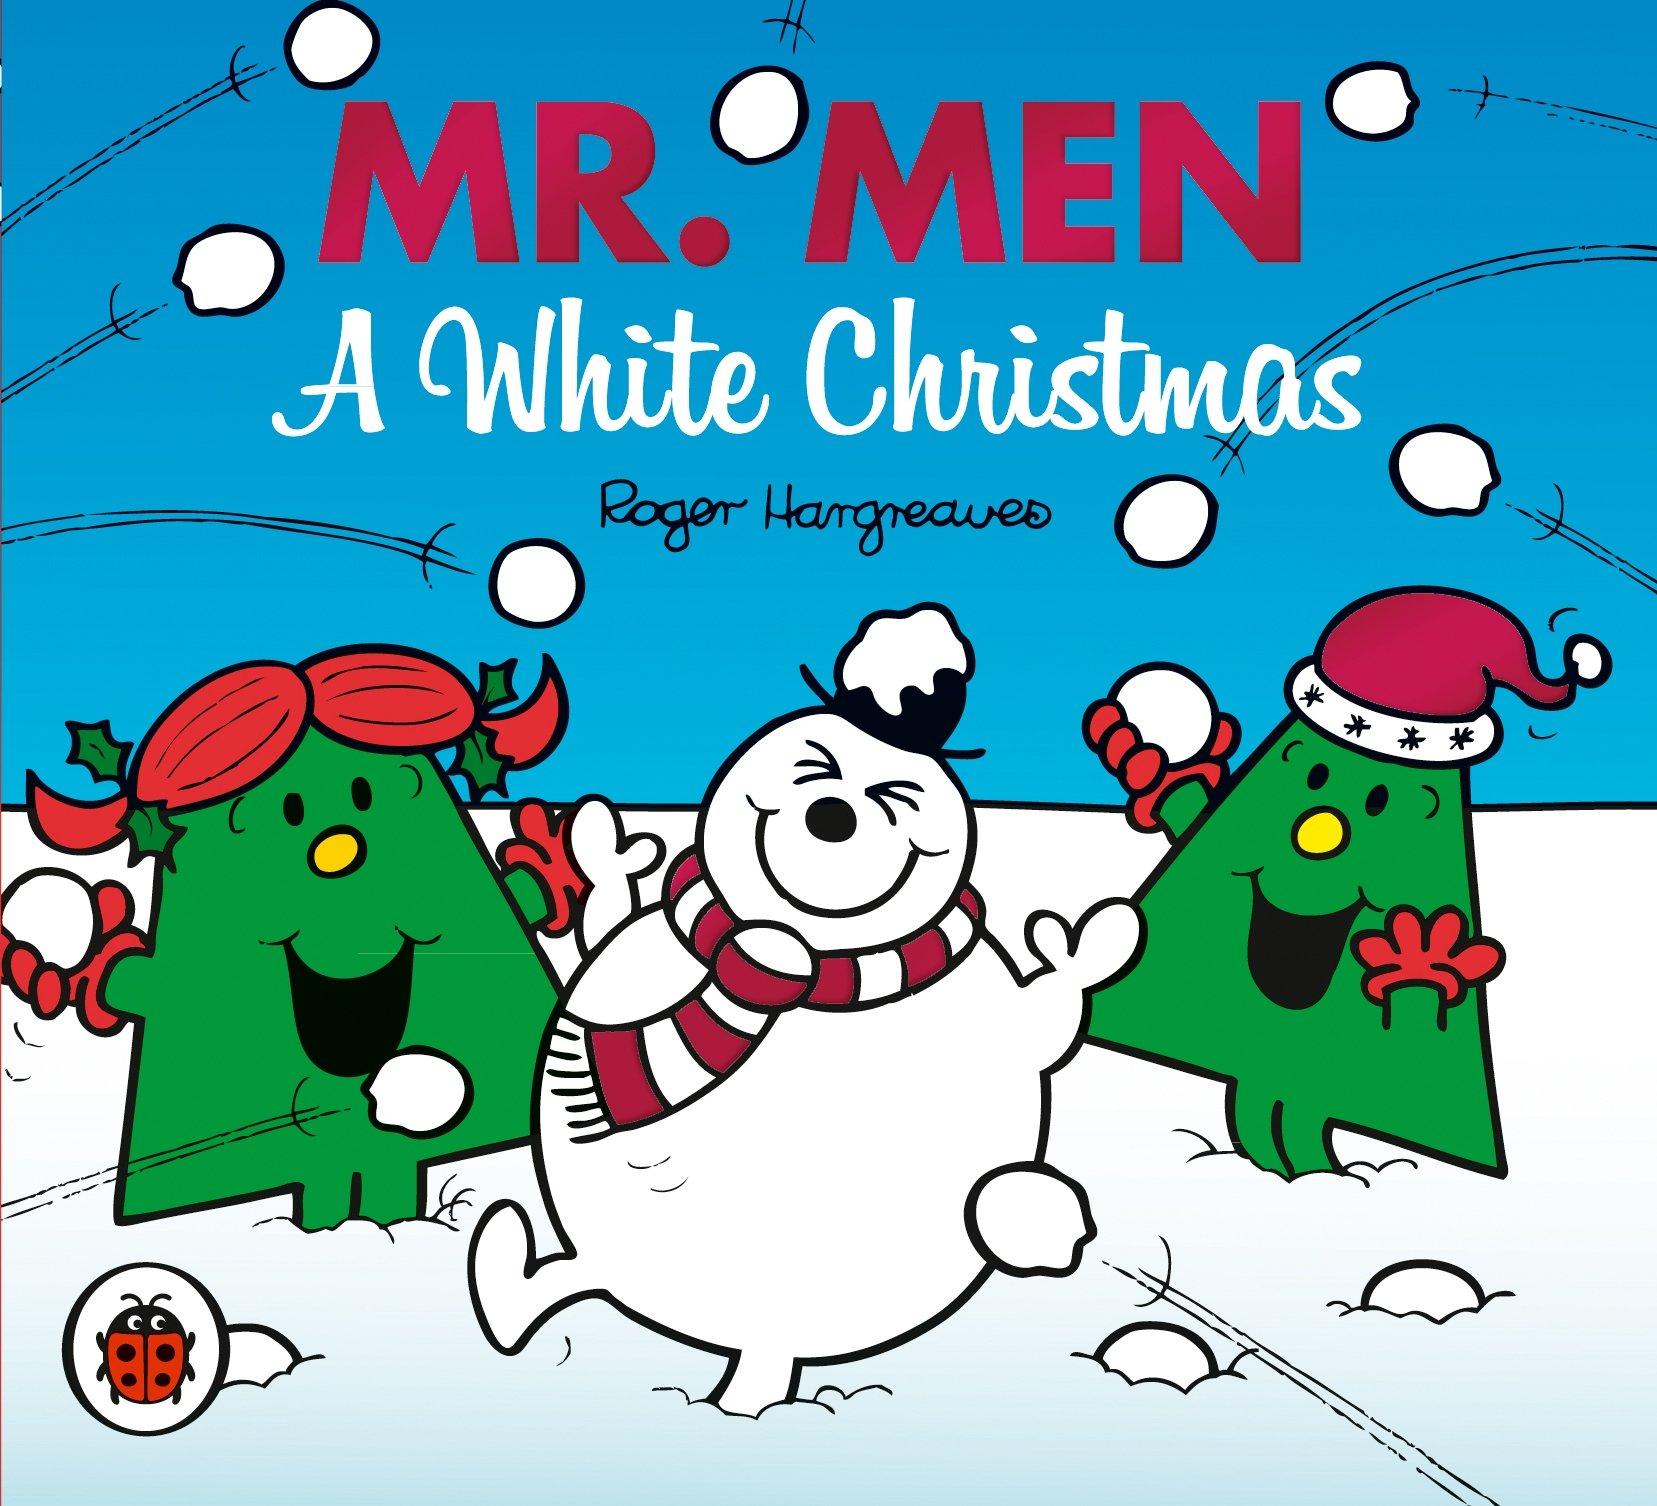 Mr Men - a White Christmas: Roger Hargreaves: 9781409388241: Amazon ...